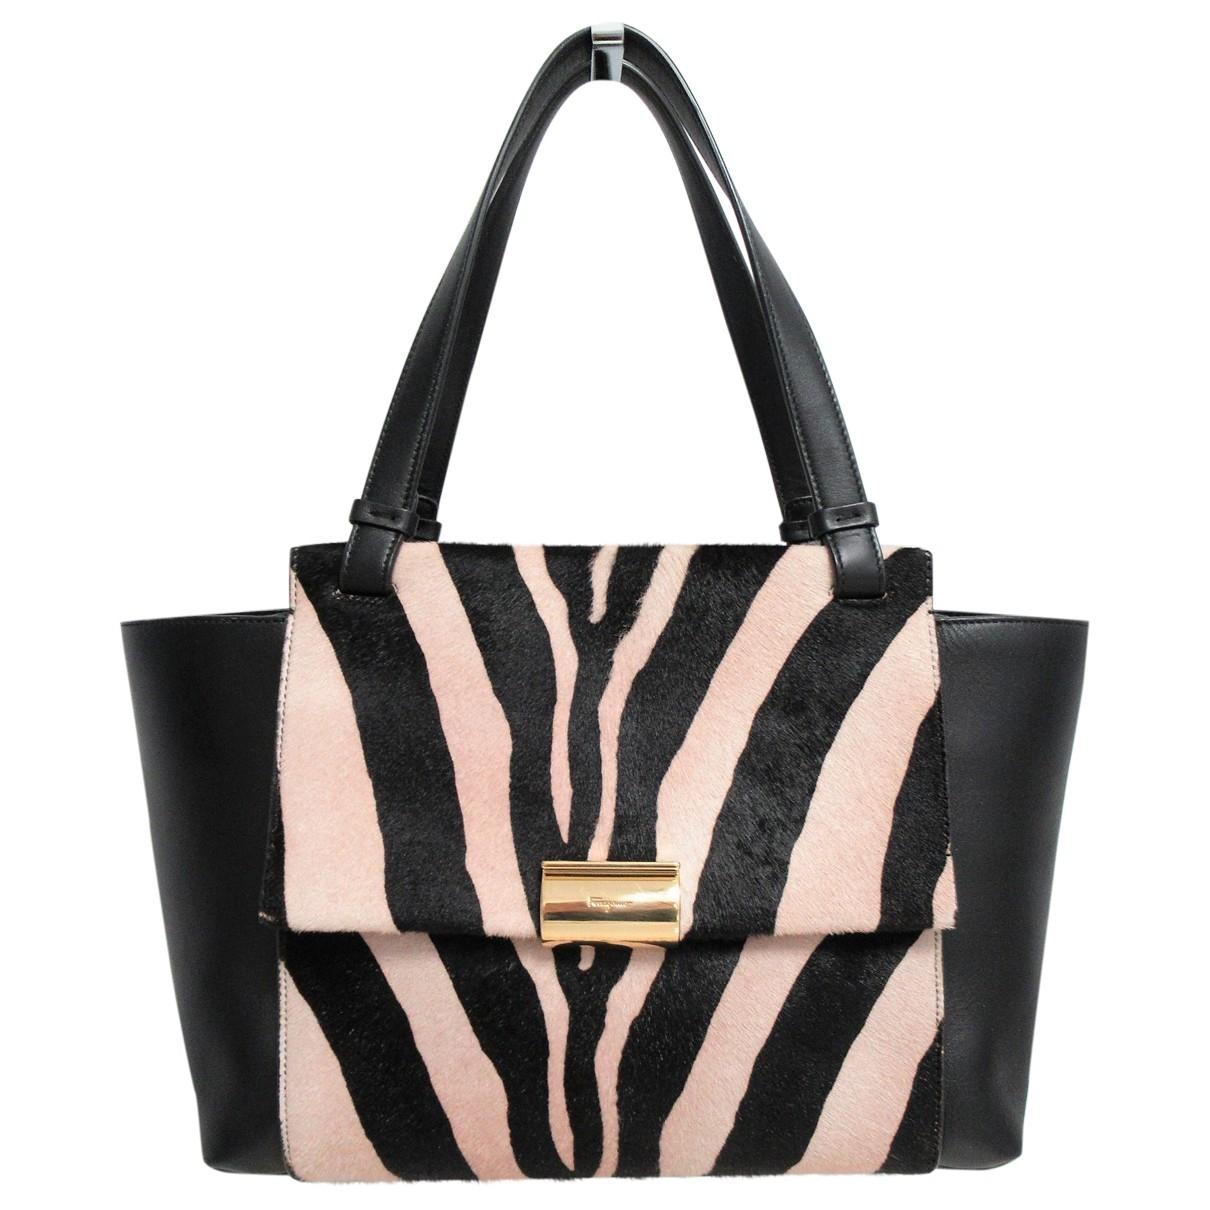 Salvatore Ferragamo \N Black Pony-style calfskin handbag for Women \N